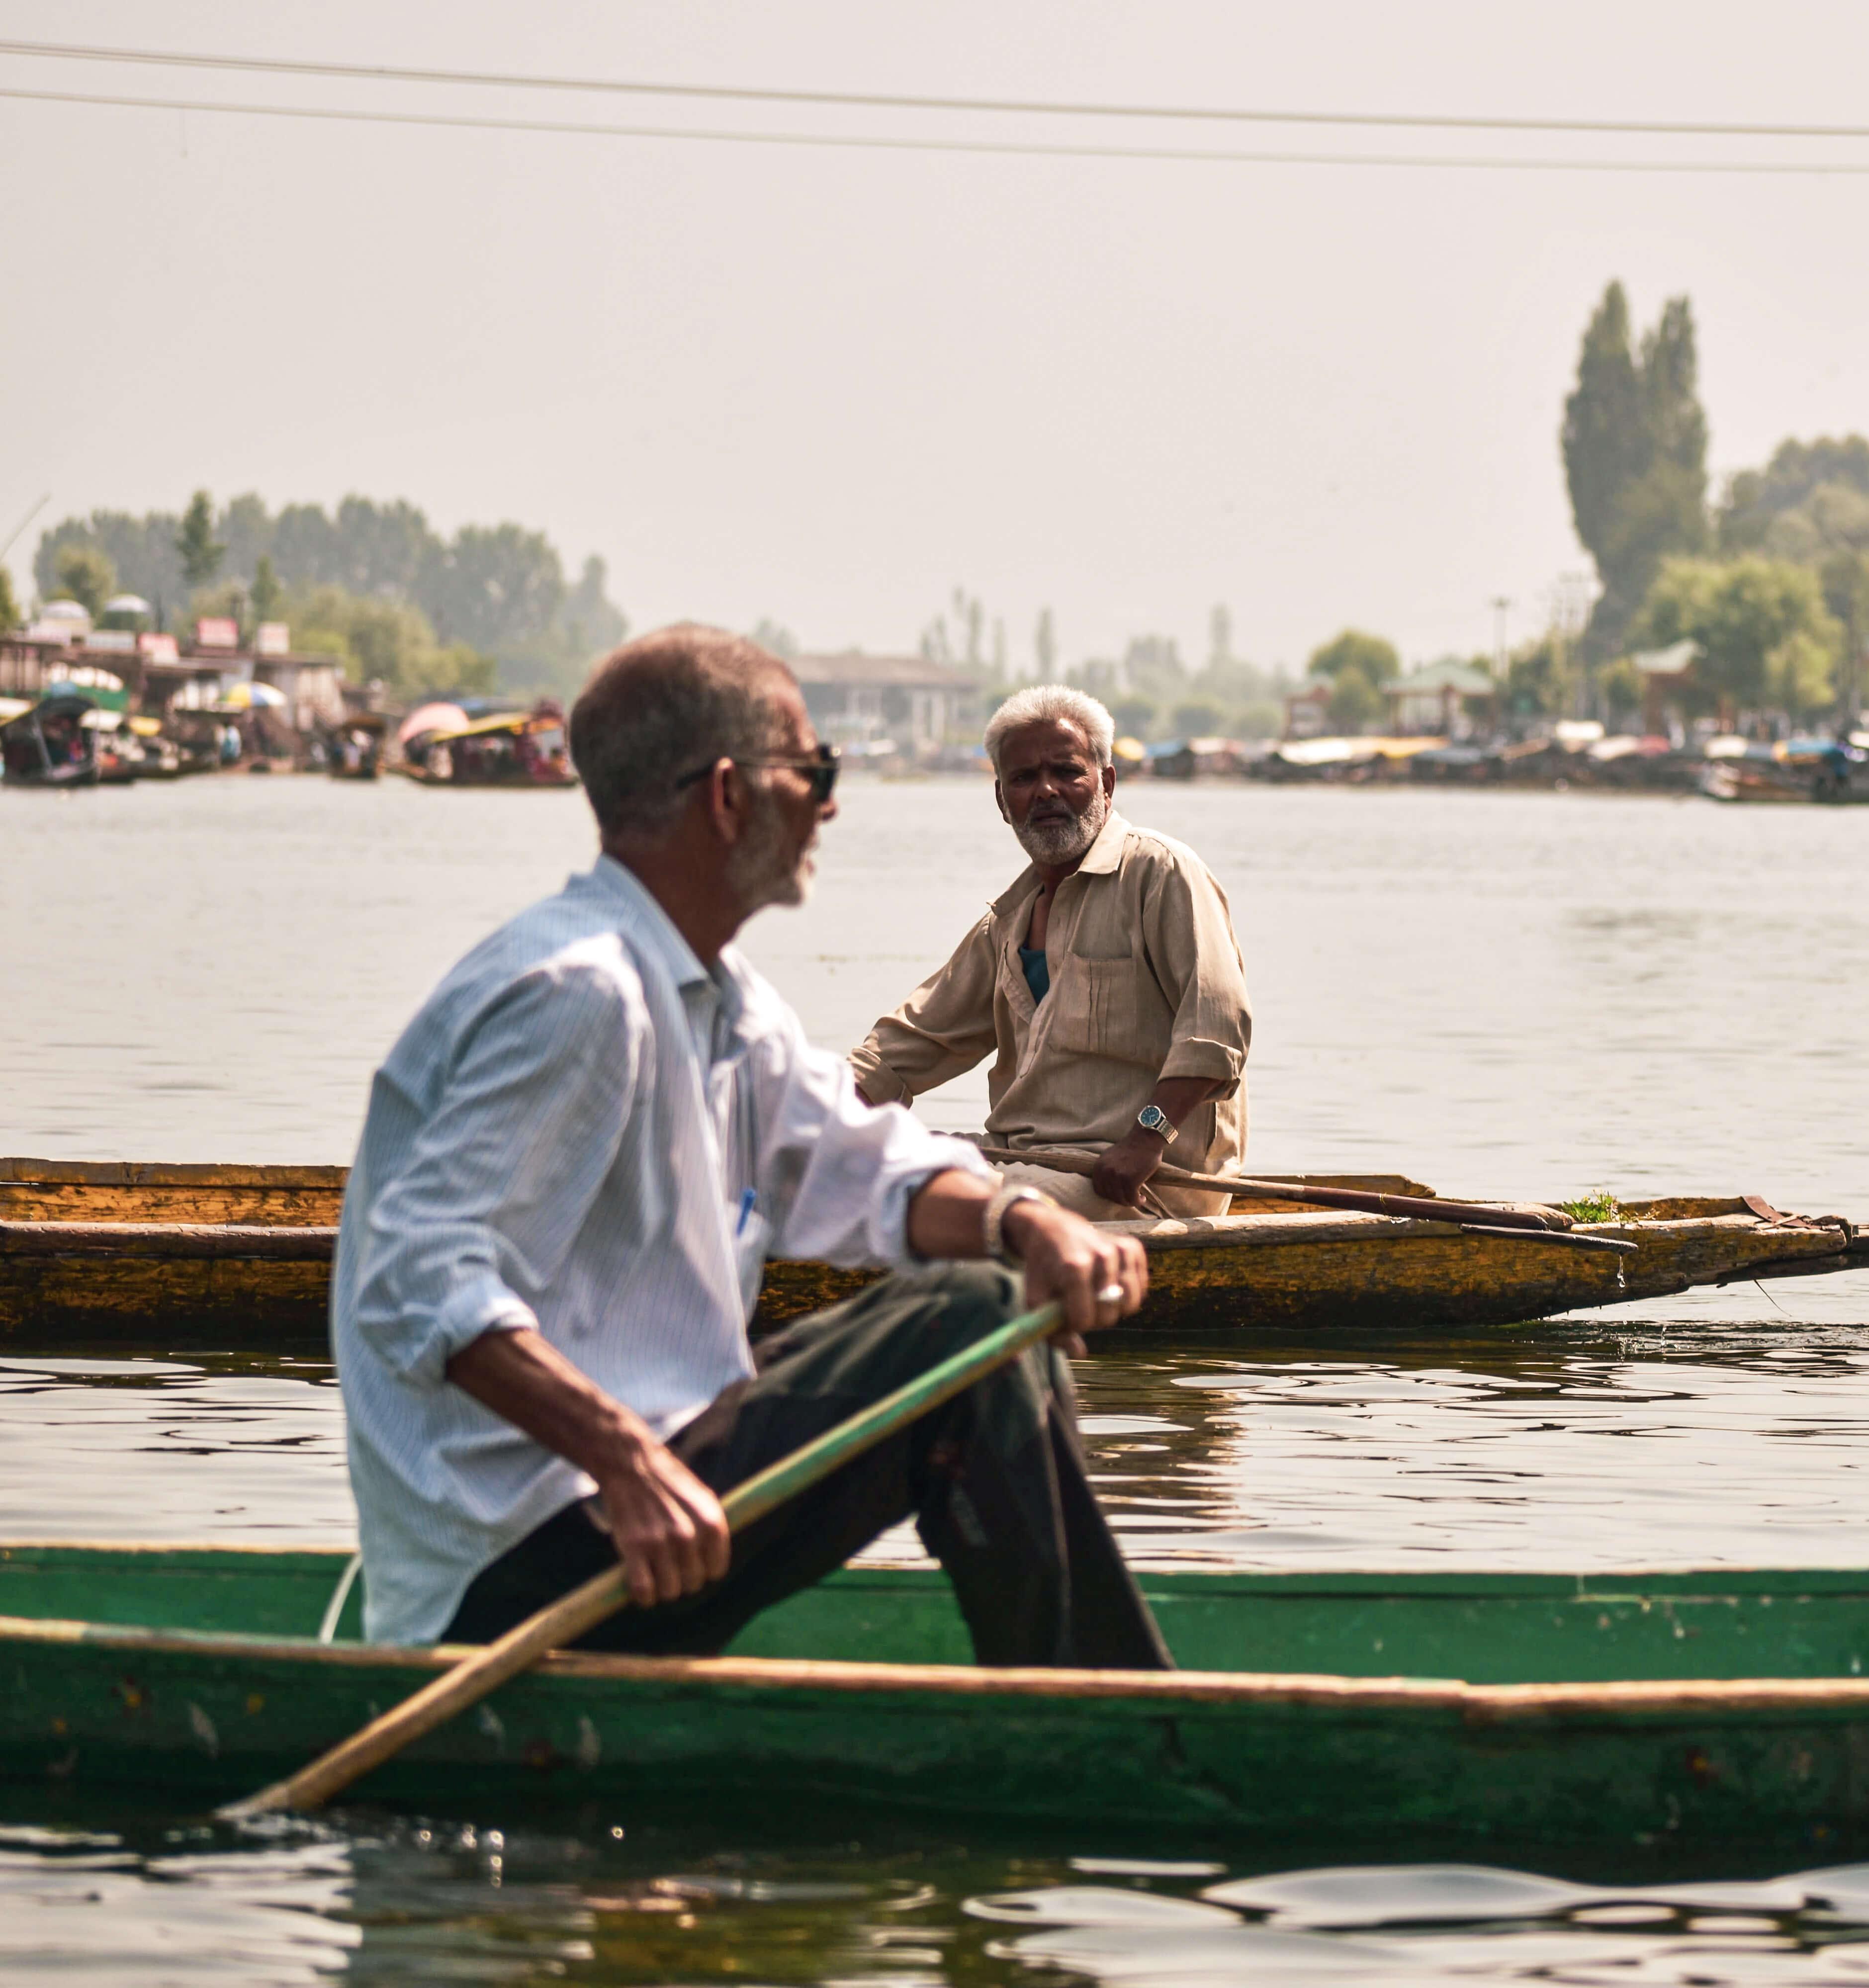 Srinagar Travel Guide - Meeting each other